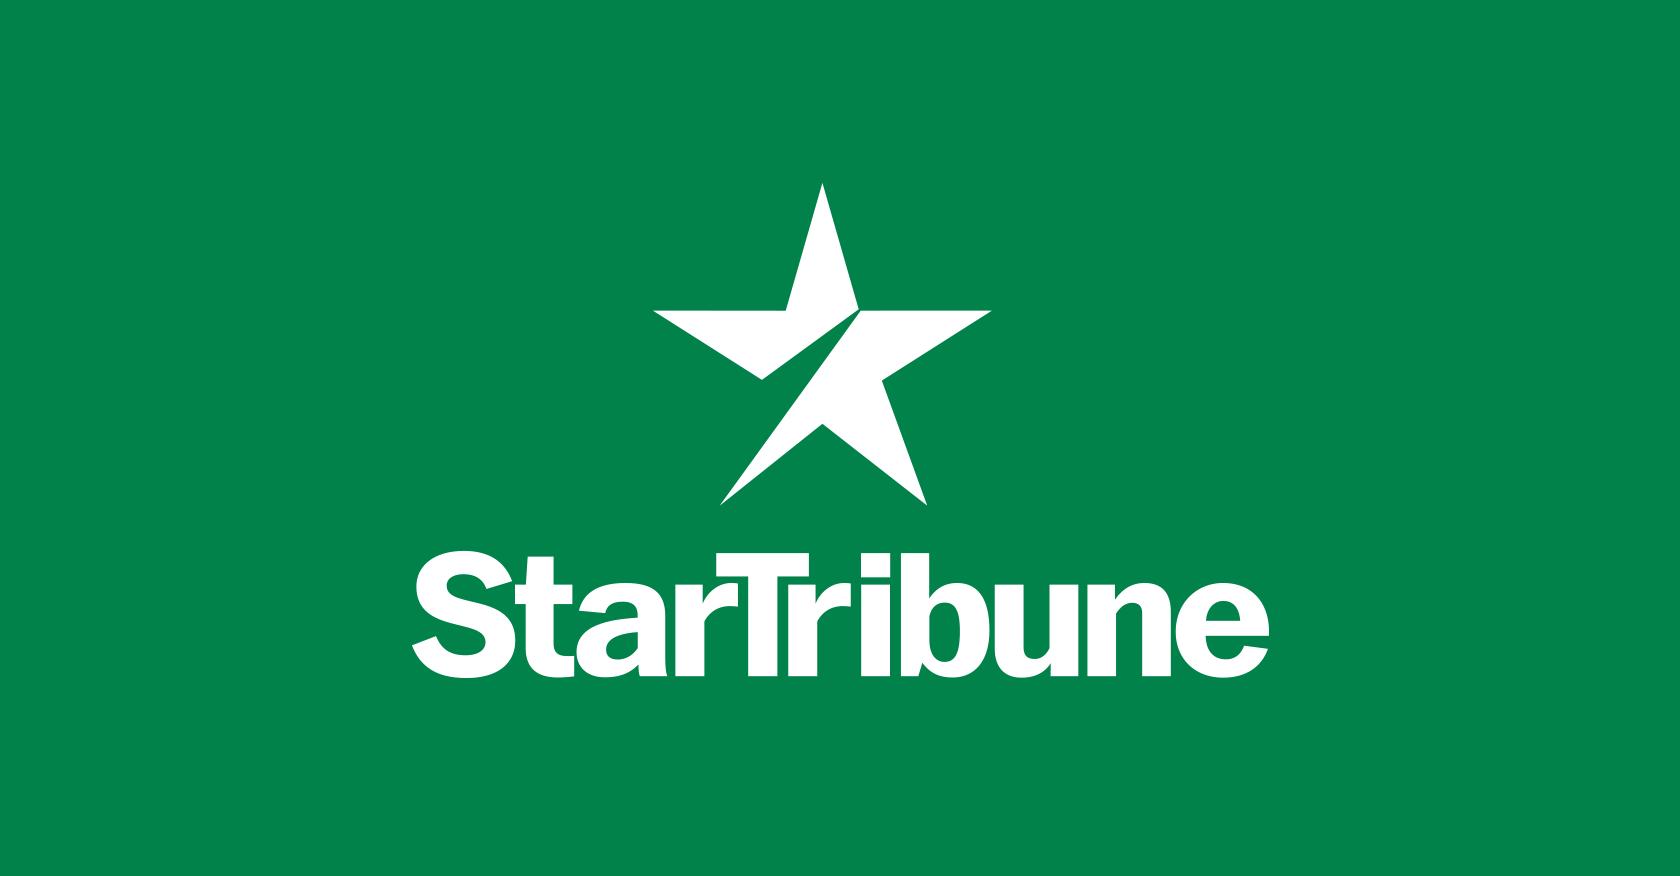 www.startribune.com: Judges scrutinize suit's claims in Harvard racial bias case